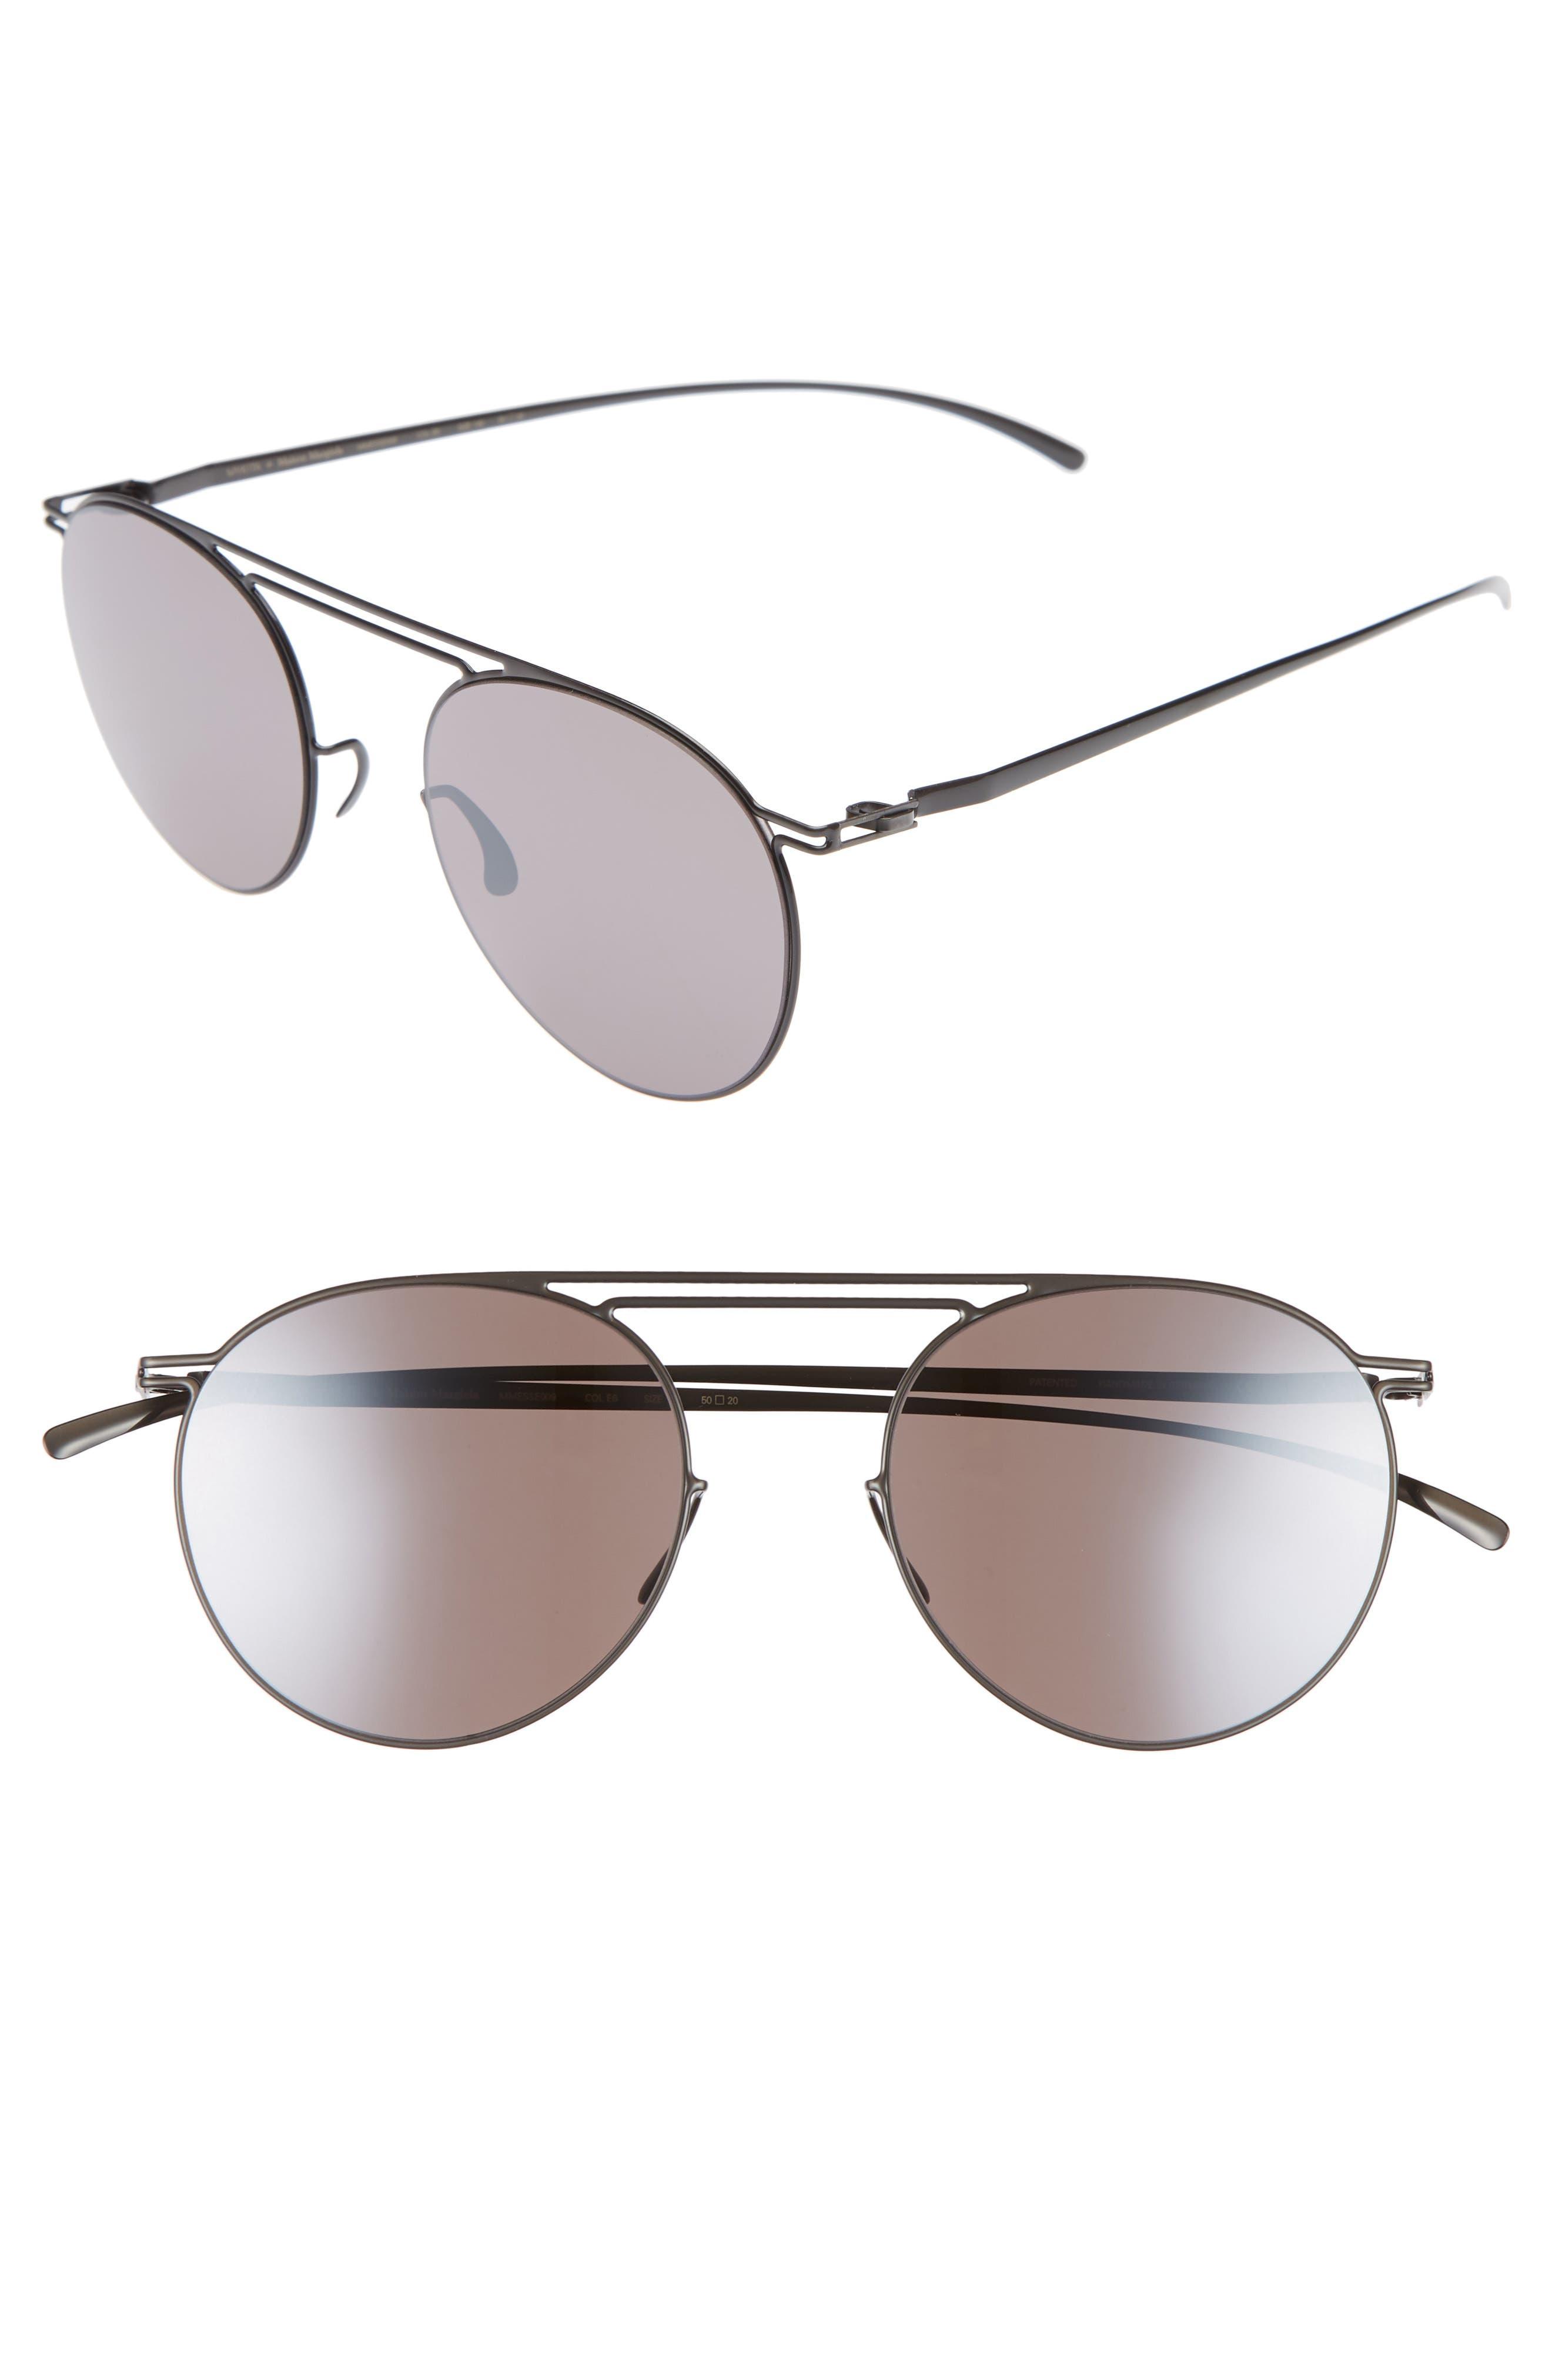 MMESSE009 50mm Sunglasses,                         Main,                         color,